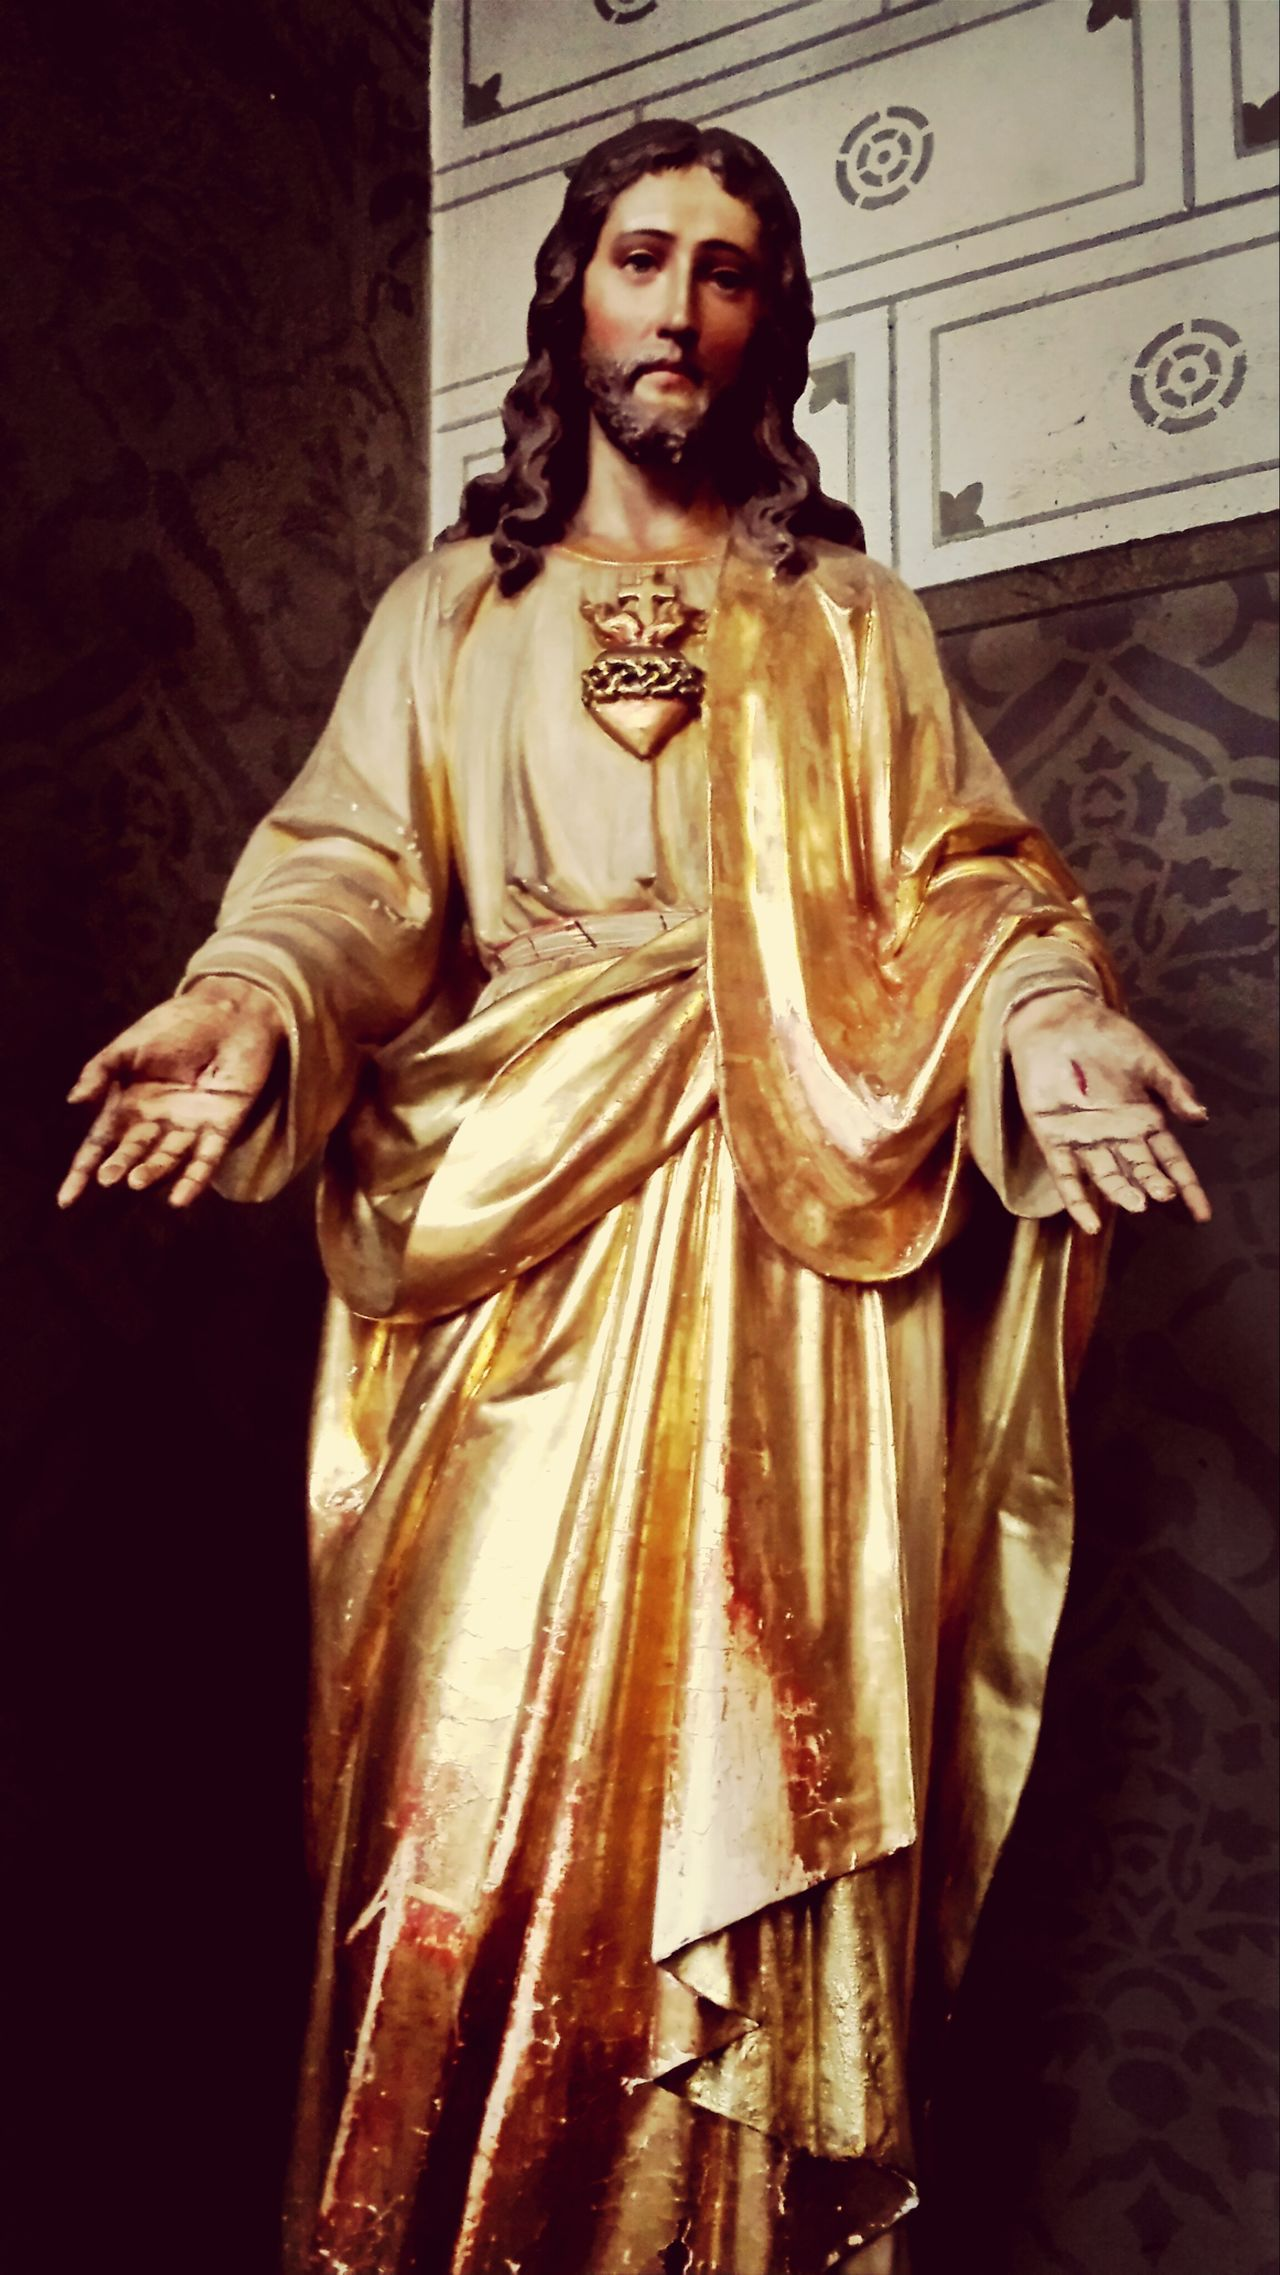 Jesus Christ Jesus Loves You He Gives Me So Happniess Follow Me Love Joy Knowing Honest Answers